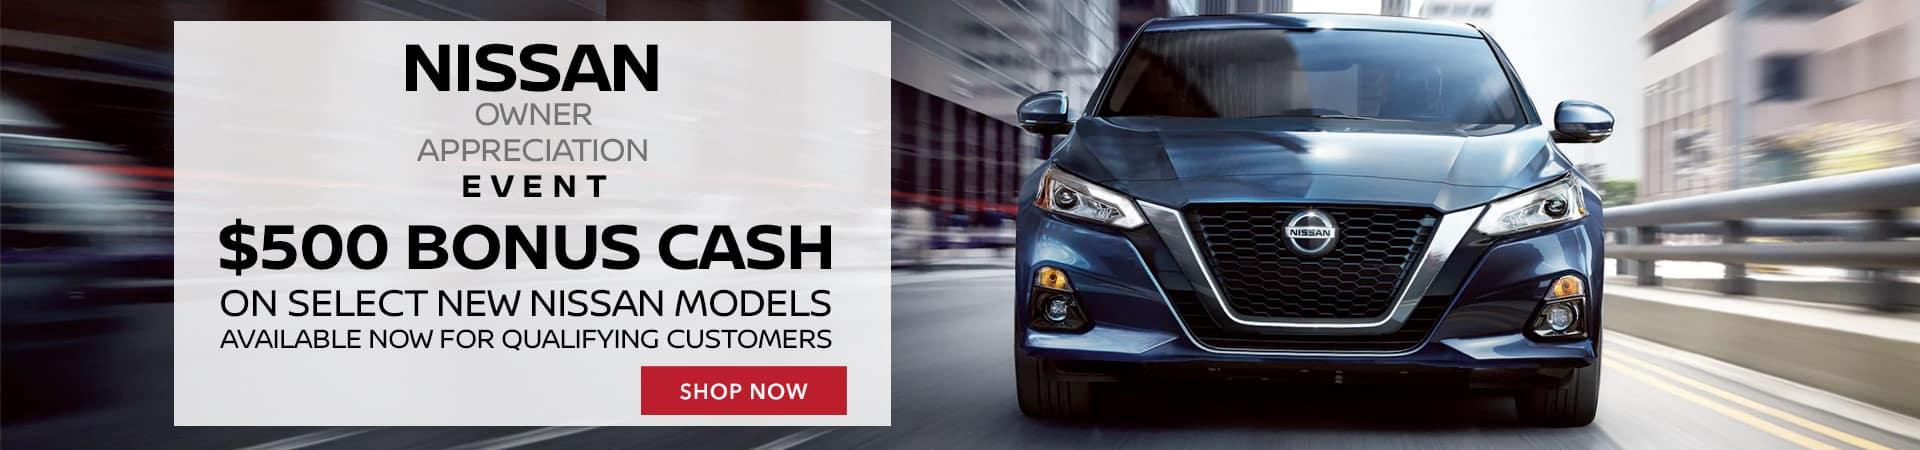 Nissan Owner Appreciation Event